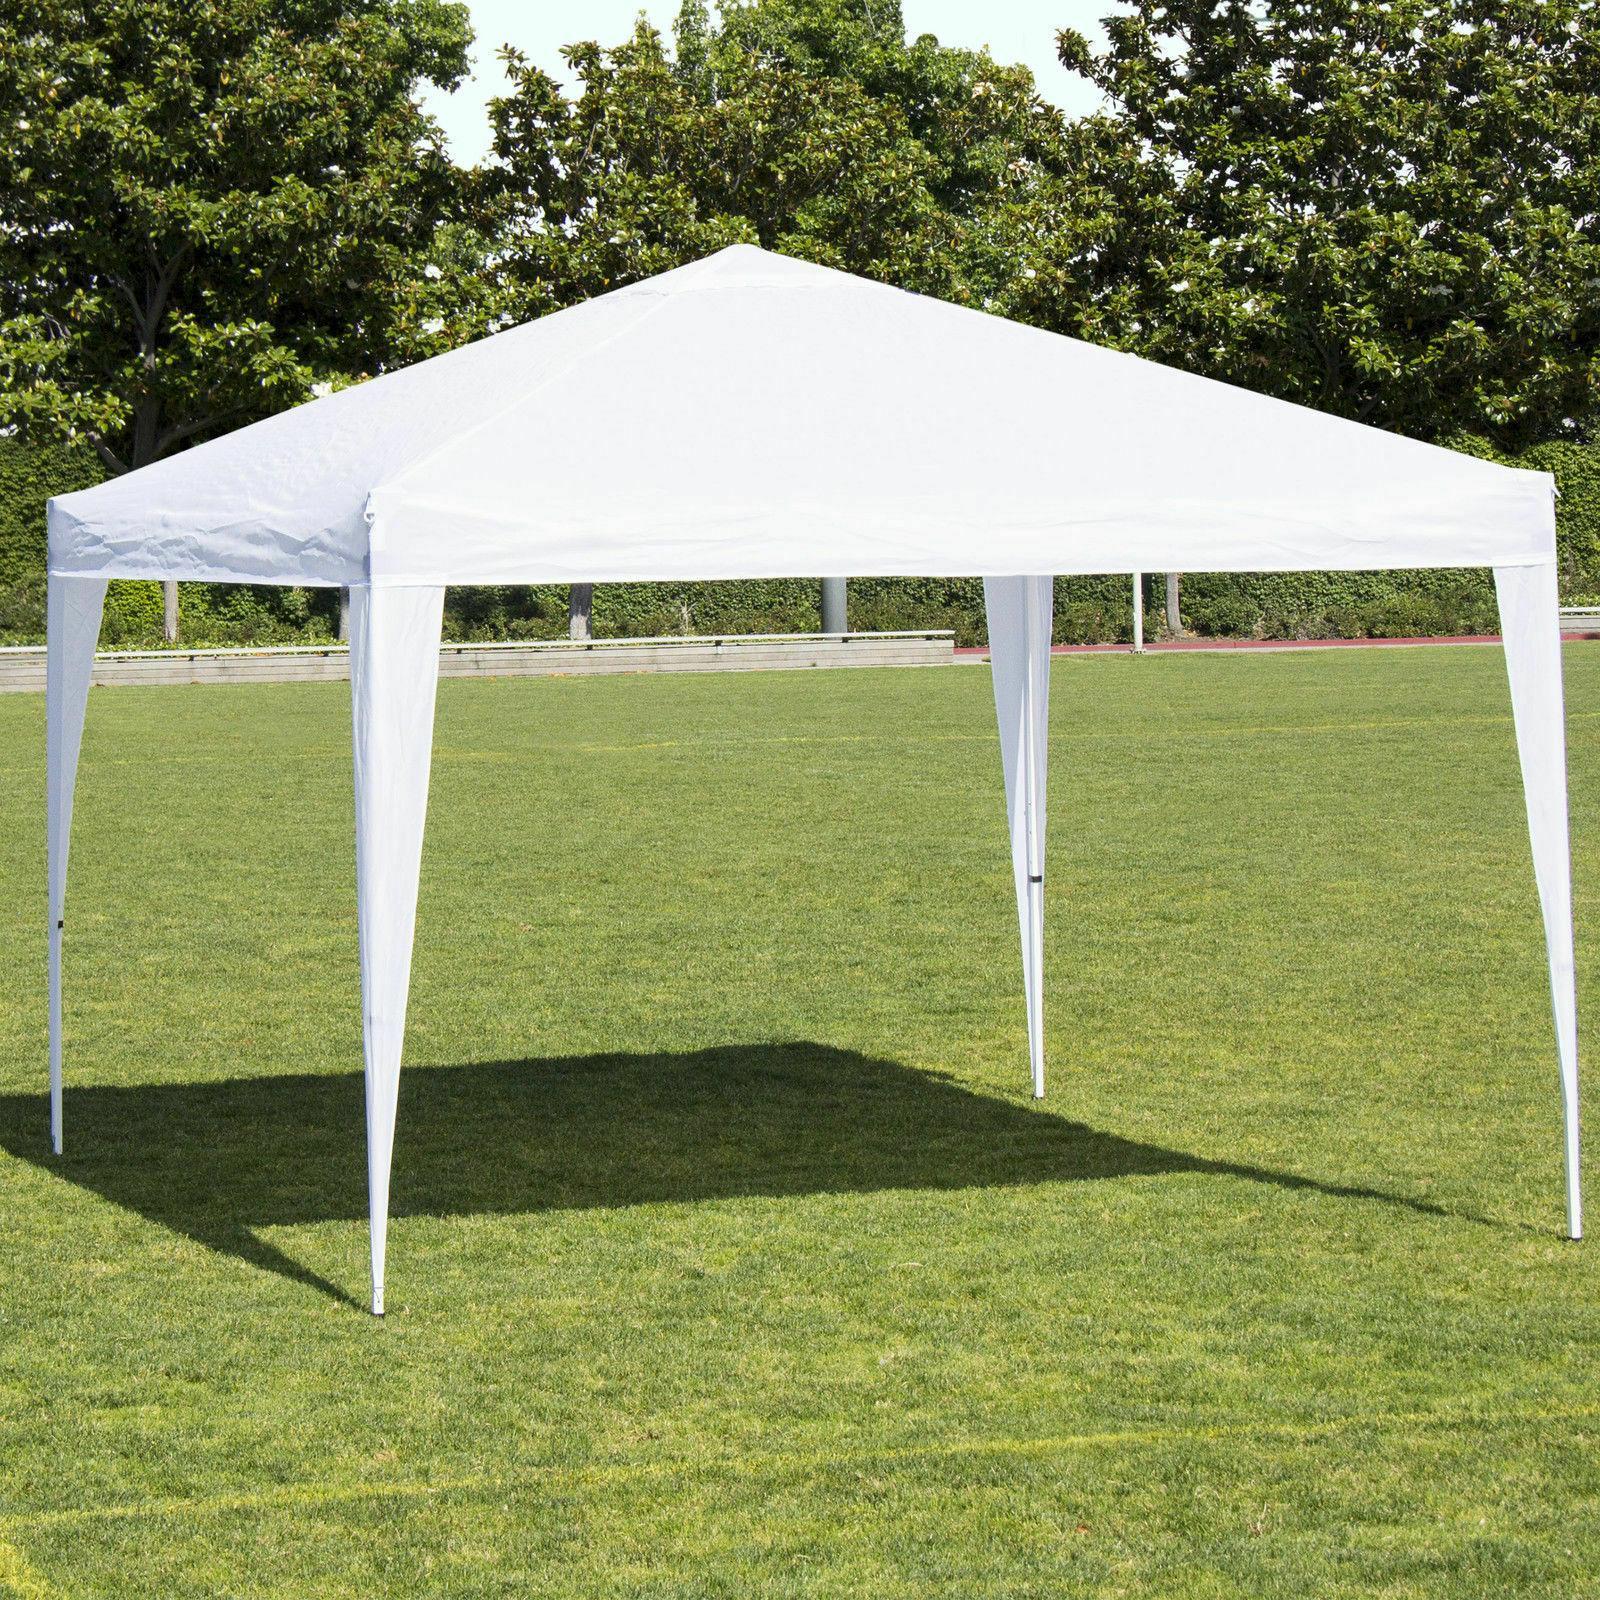 10 x 10 pop up canopy